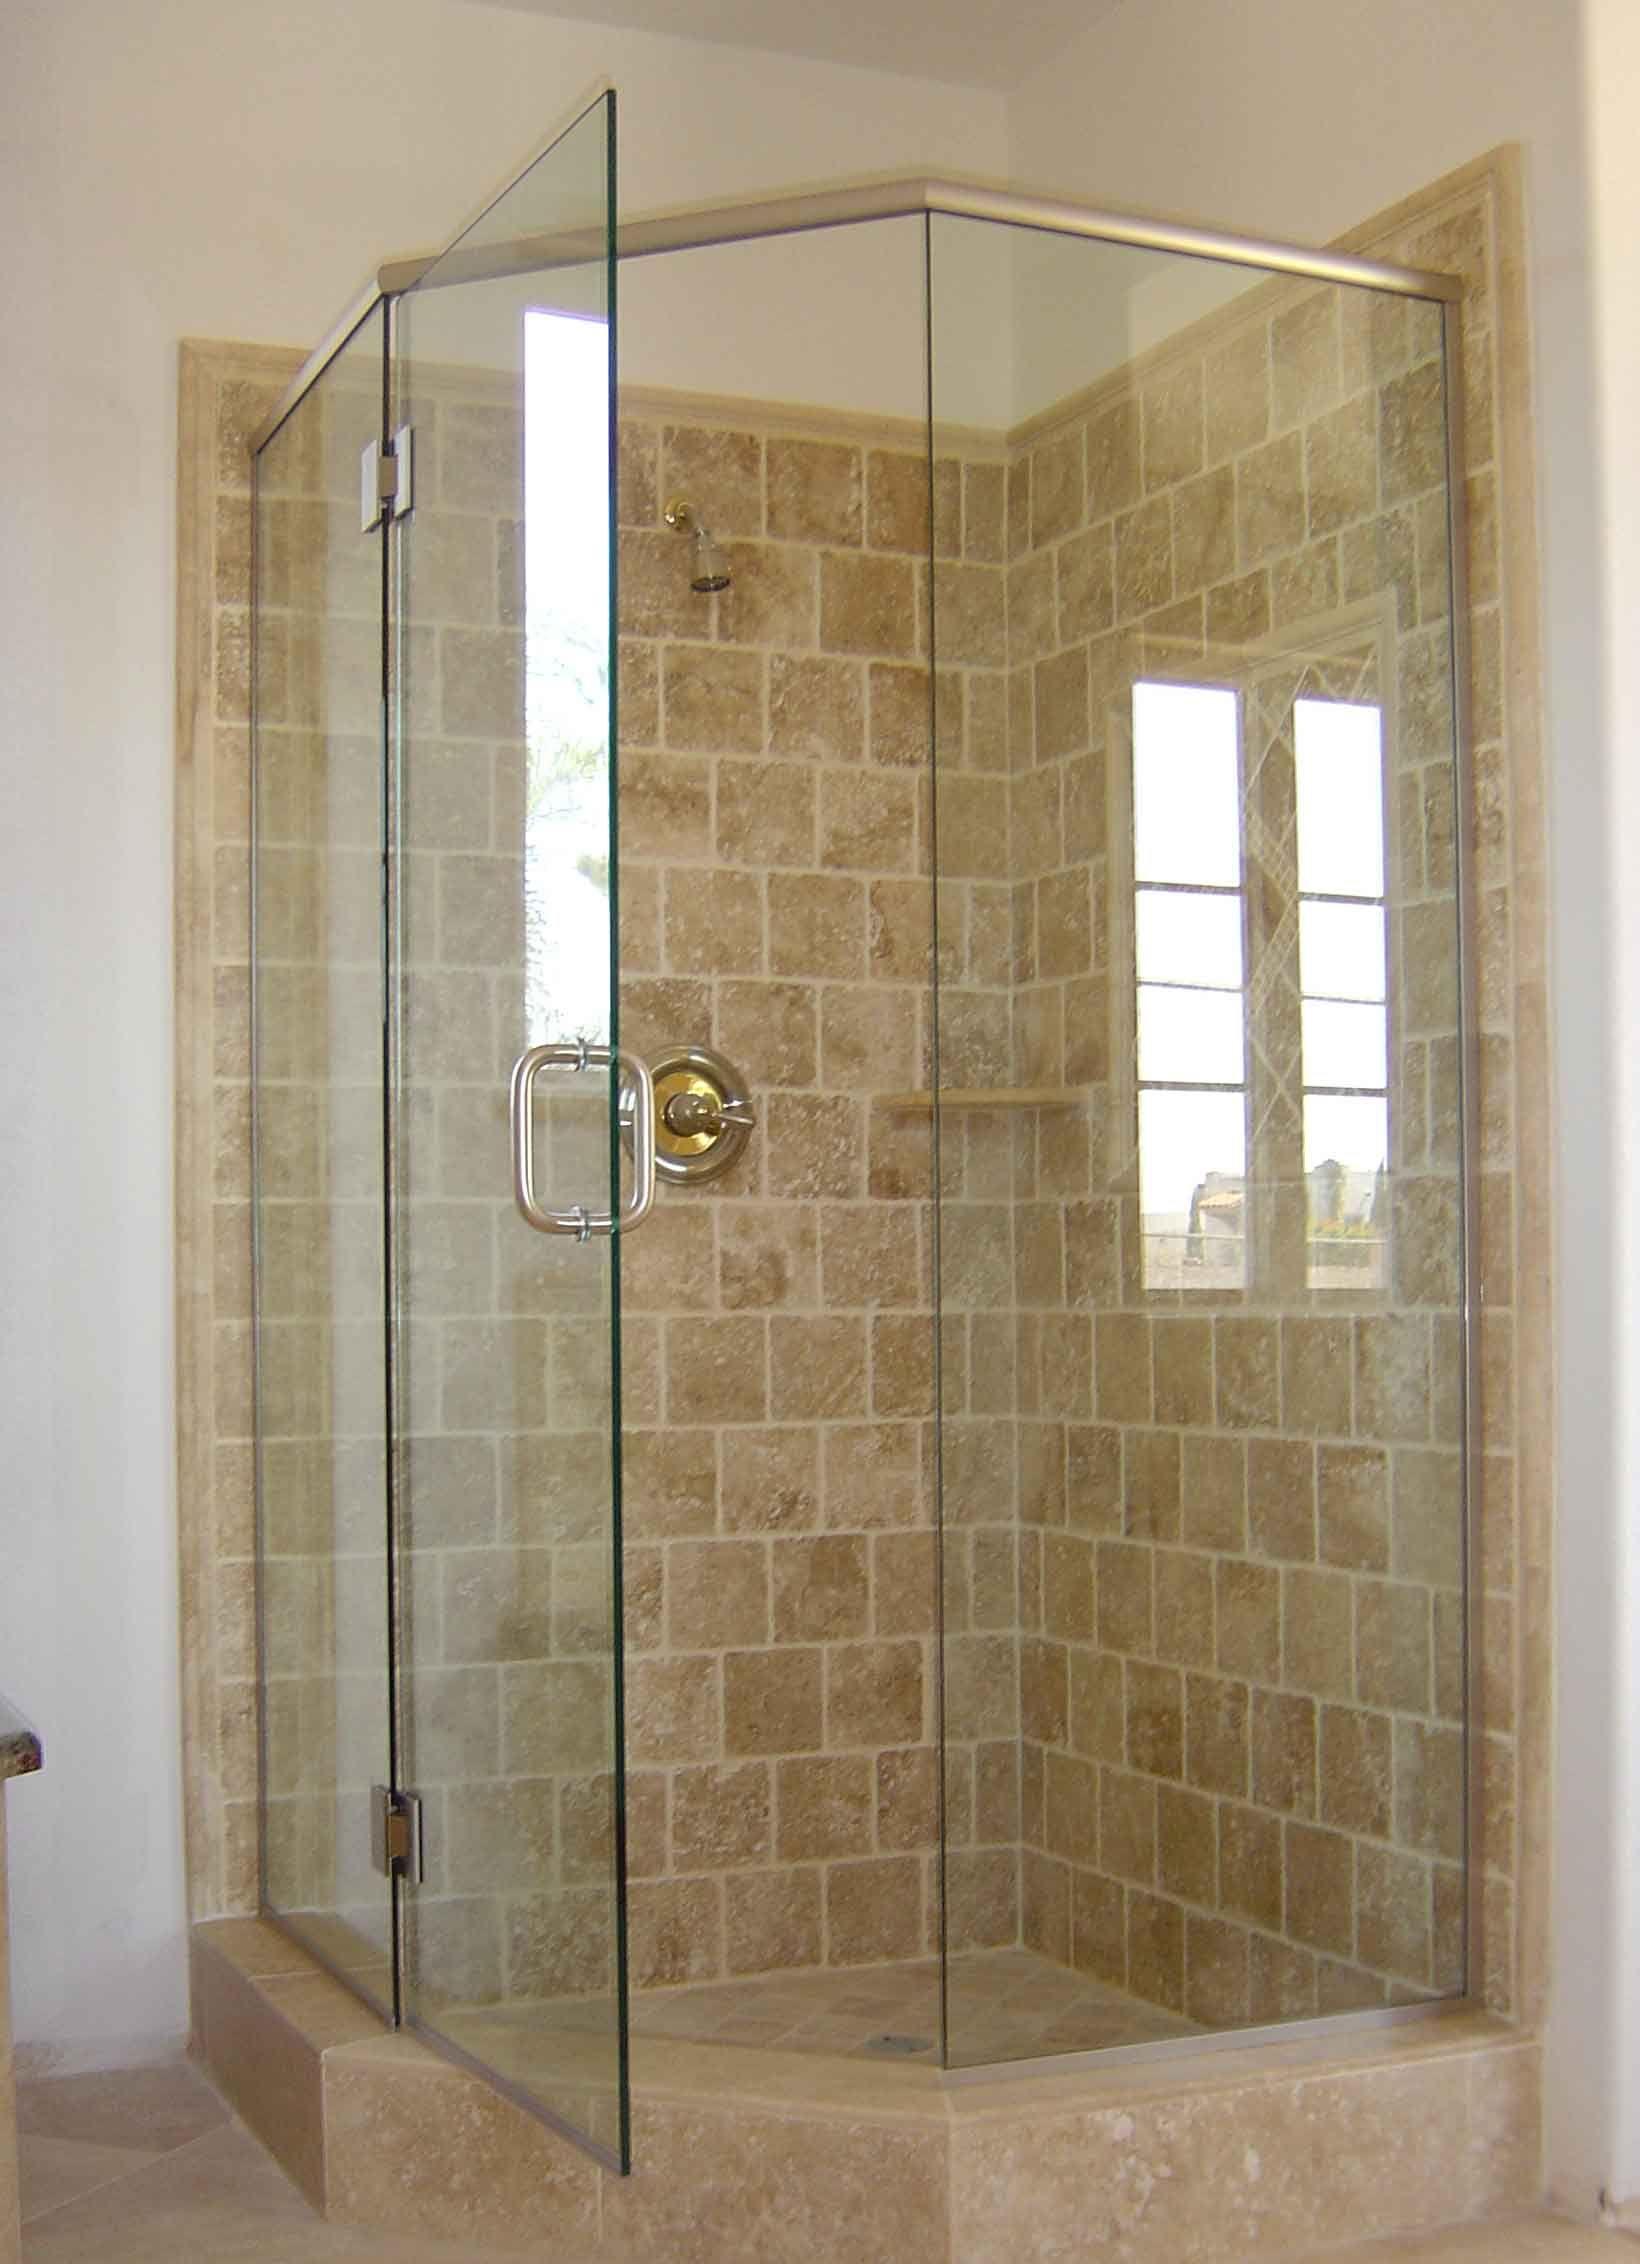 Neo Angle Corner Shower Stalls With Door